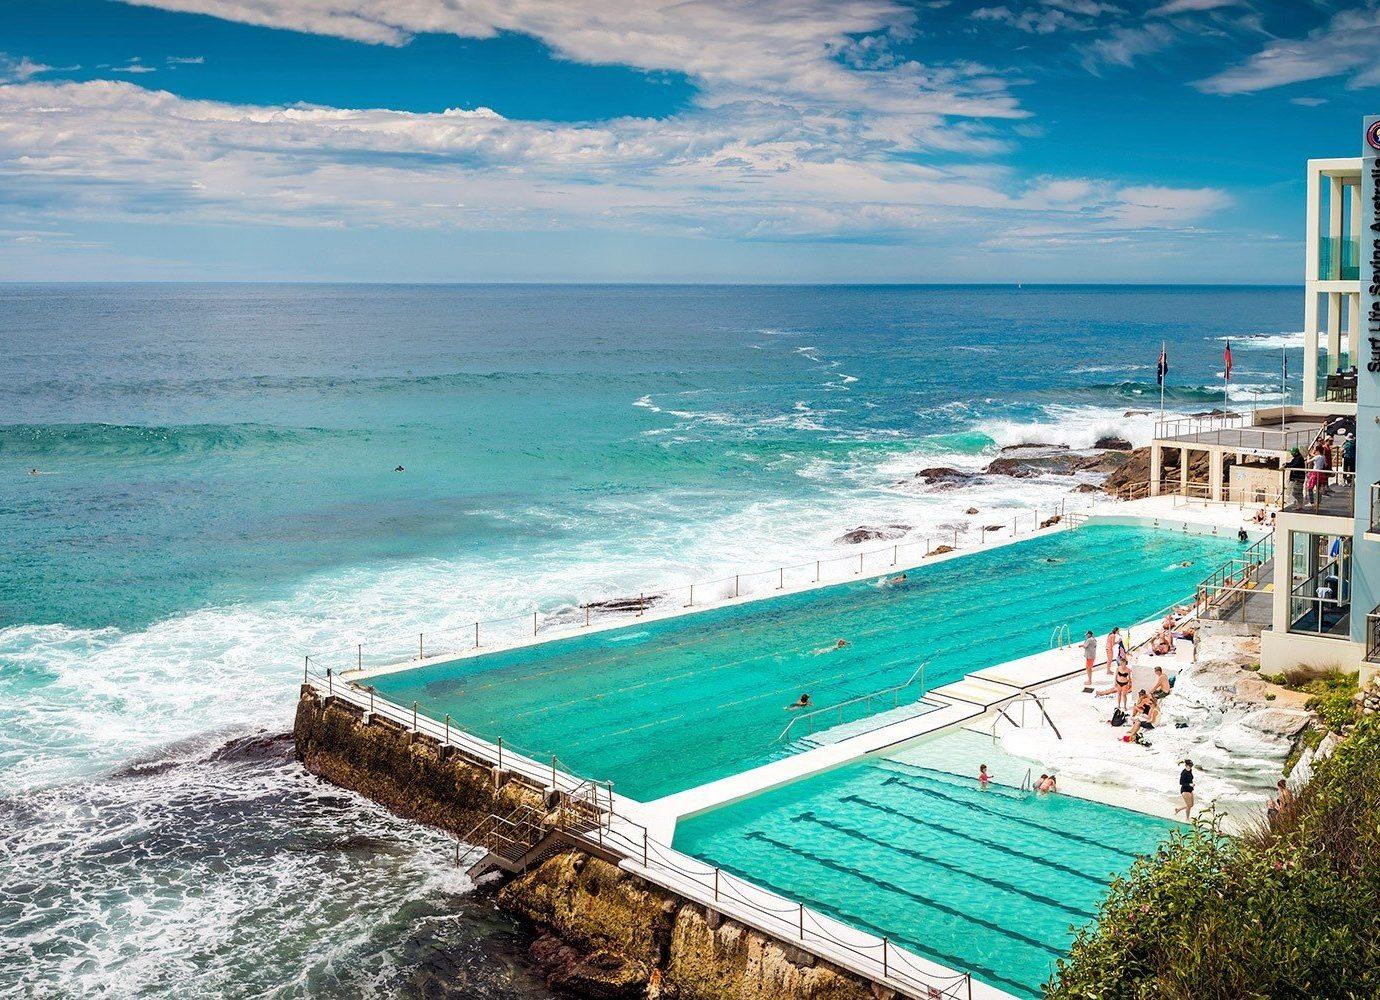 Trip Ideas water outdoor sky Beach Sea Ocean shore leisure caribbean vacation body of water Coast swimming pool Resort bay Lagoon cape cove tropics sandy